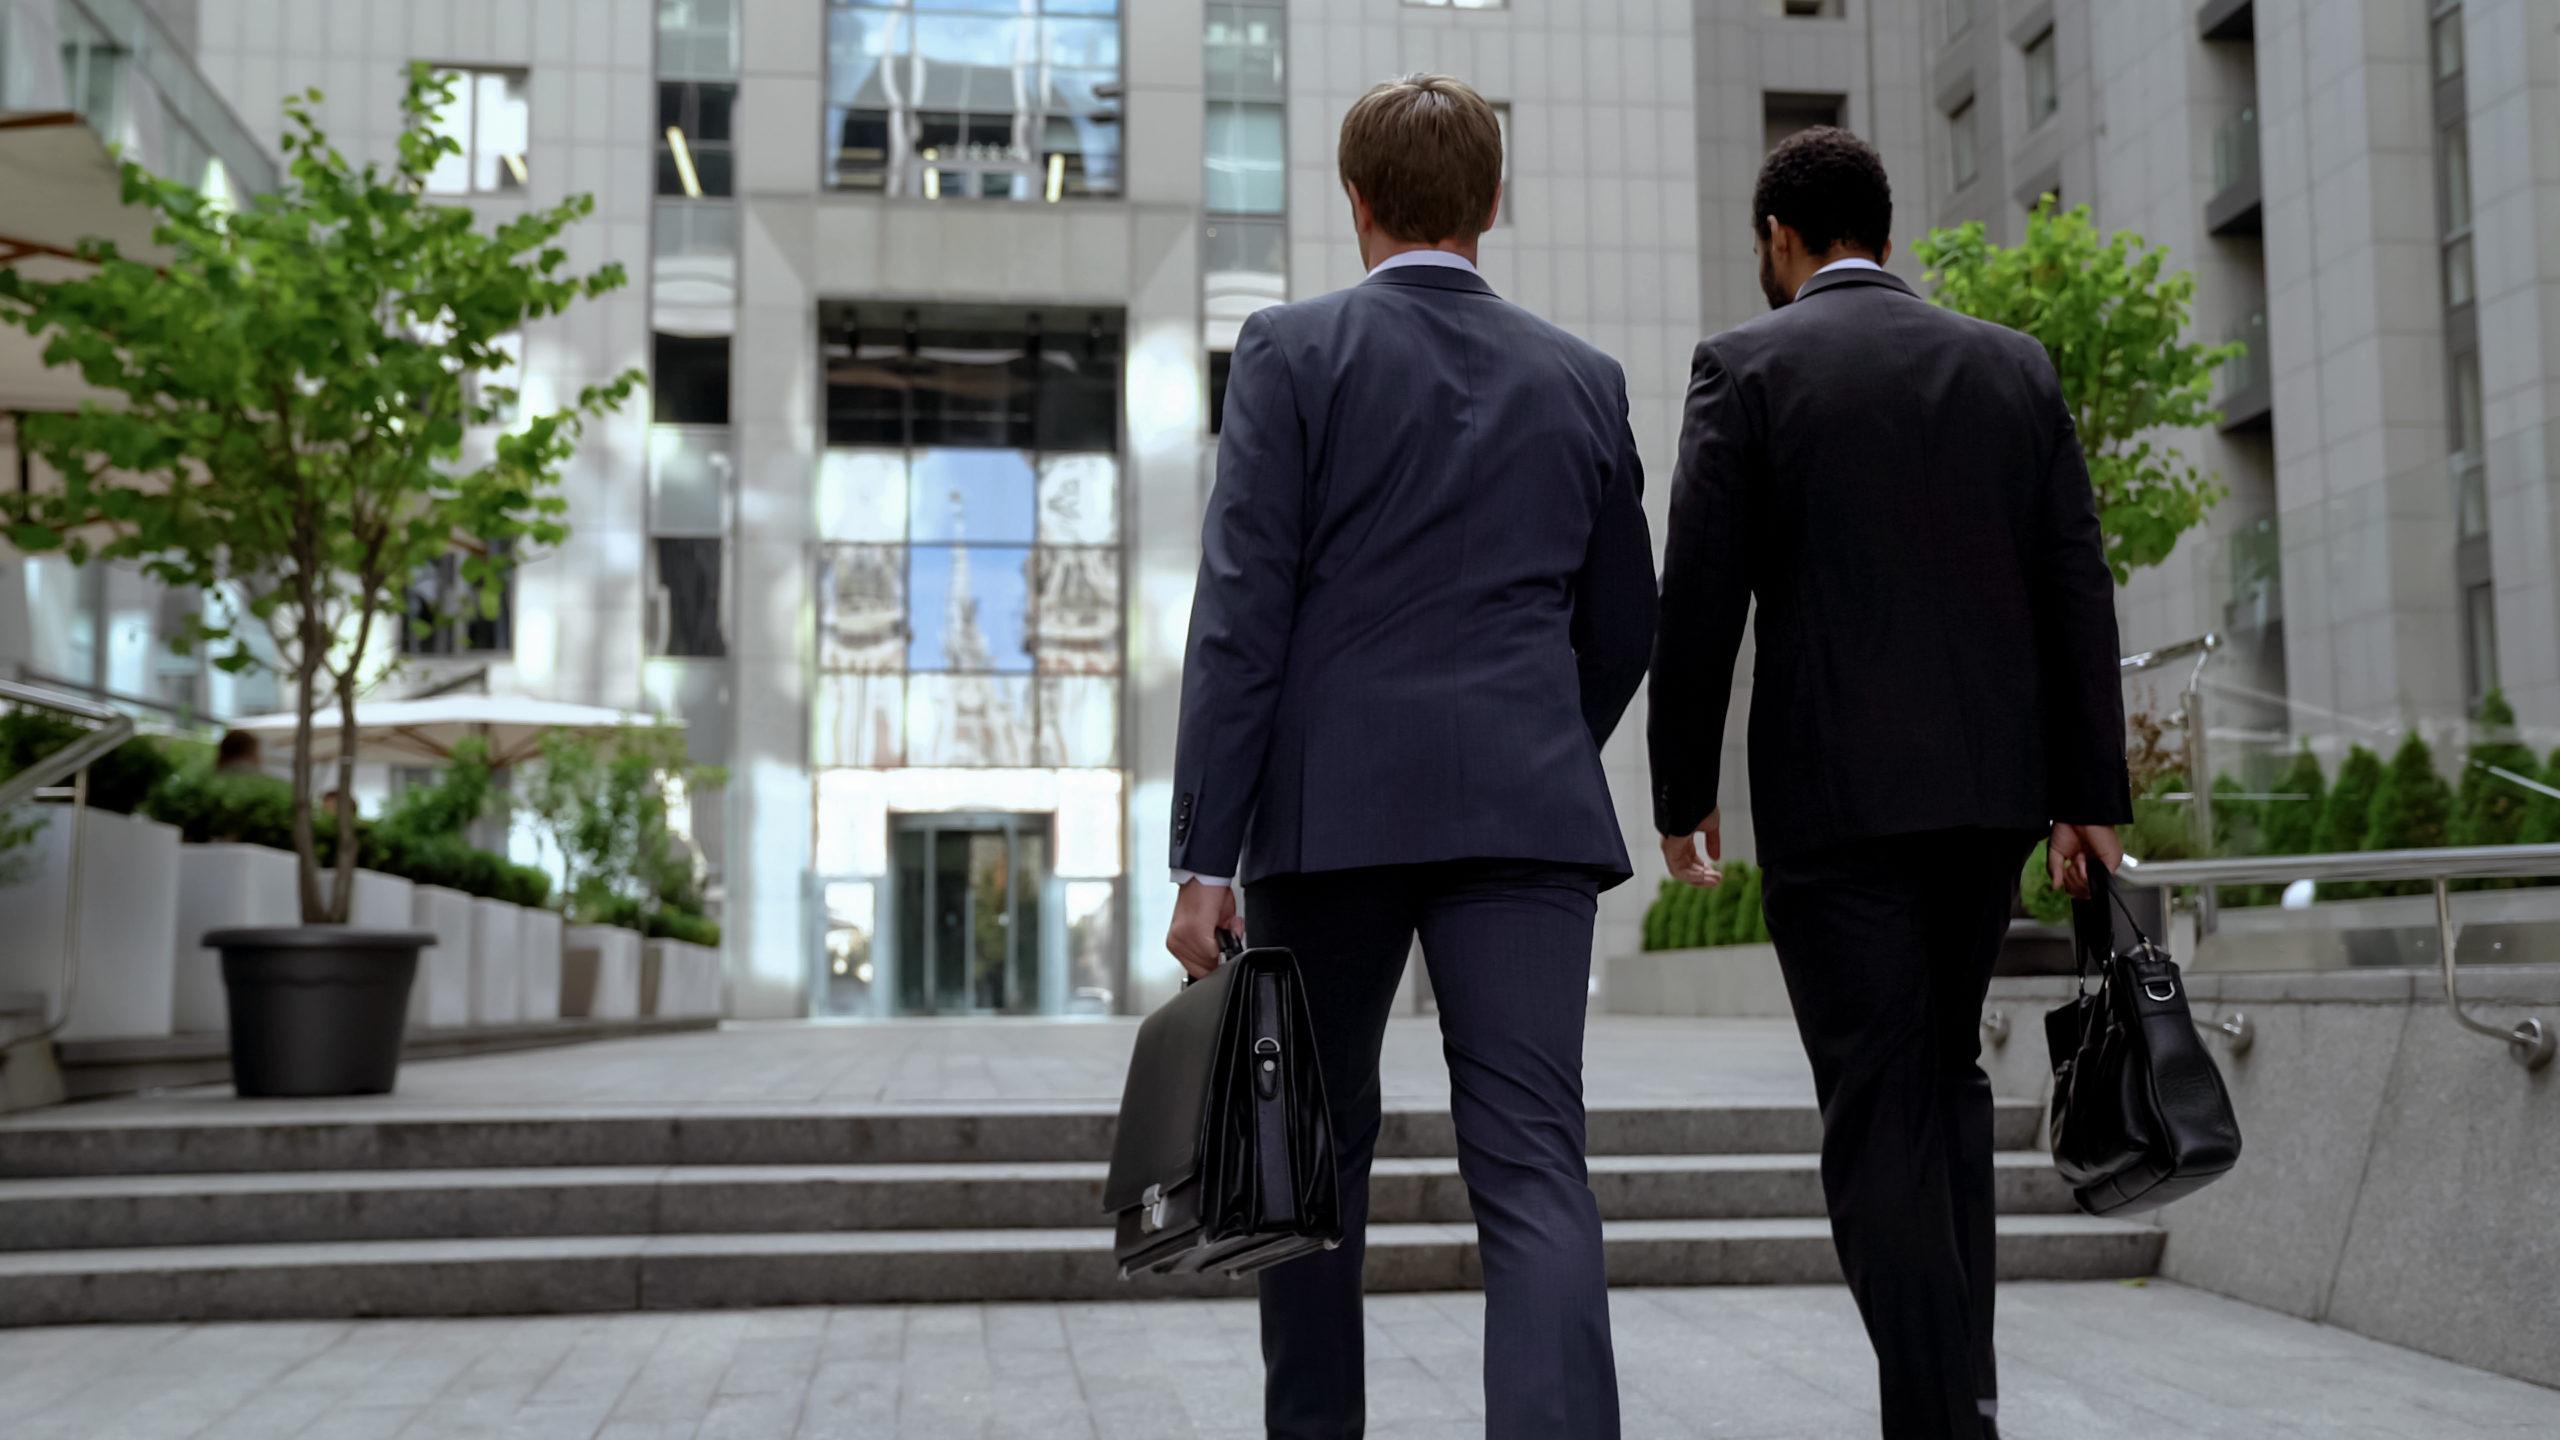 lobbying colleagues work politics institutions governance lobby influence legislation